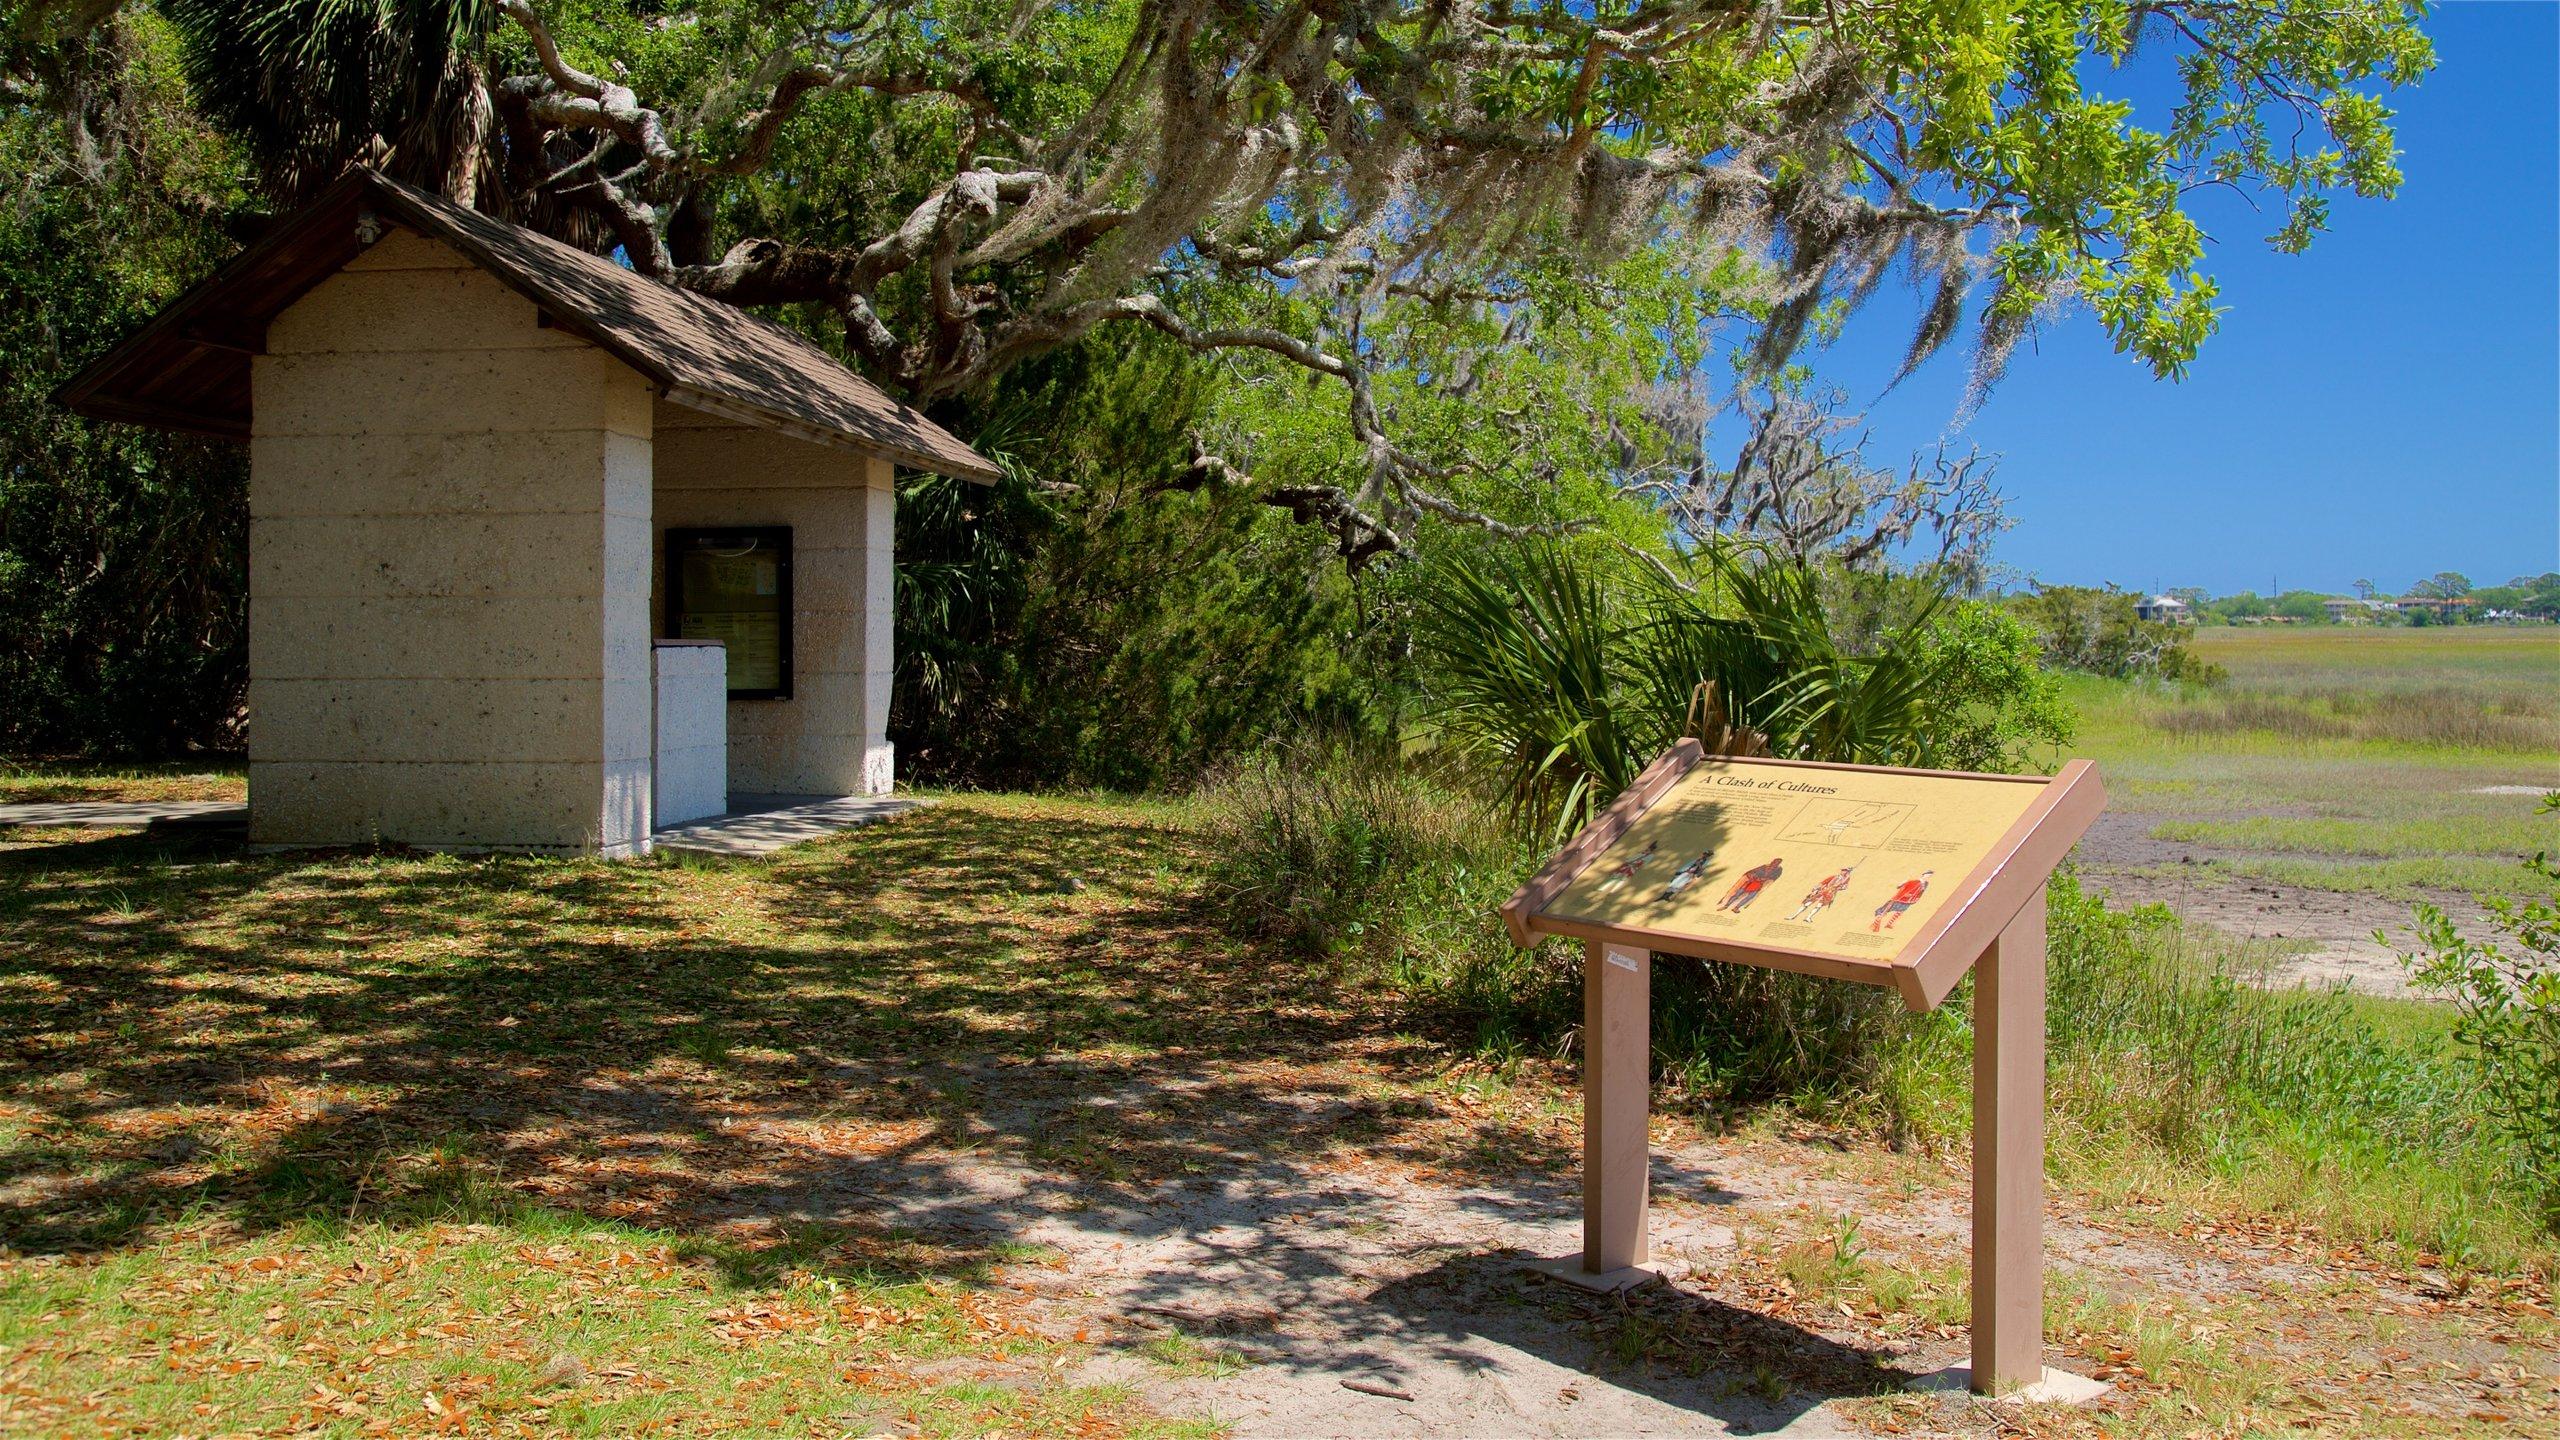 Bloody Marsh Battle Site, St. Simons Island, Georgia, USA